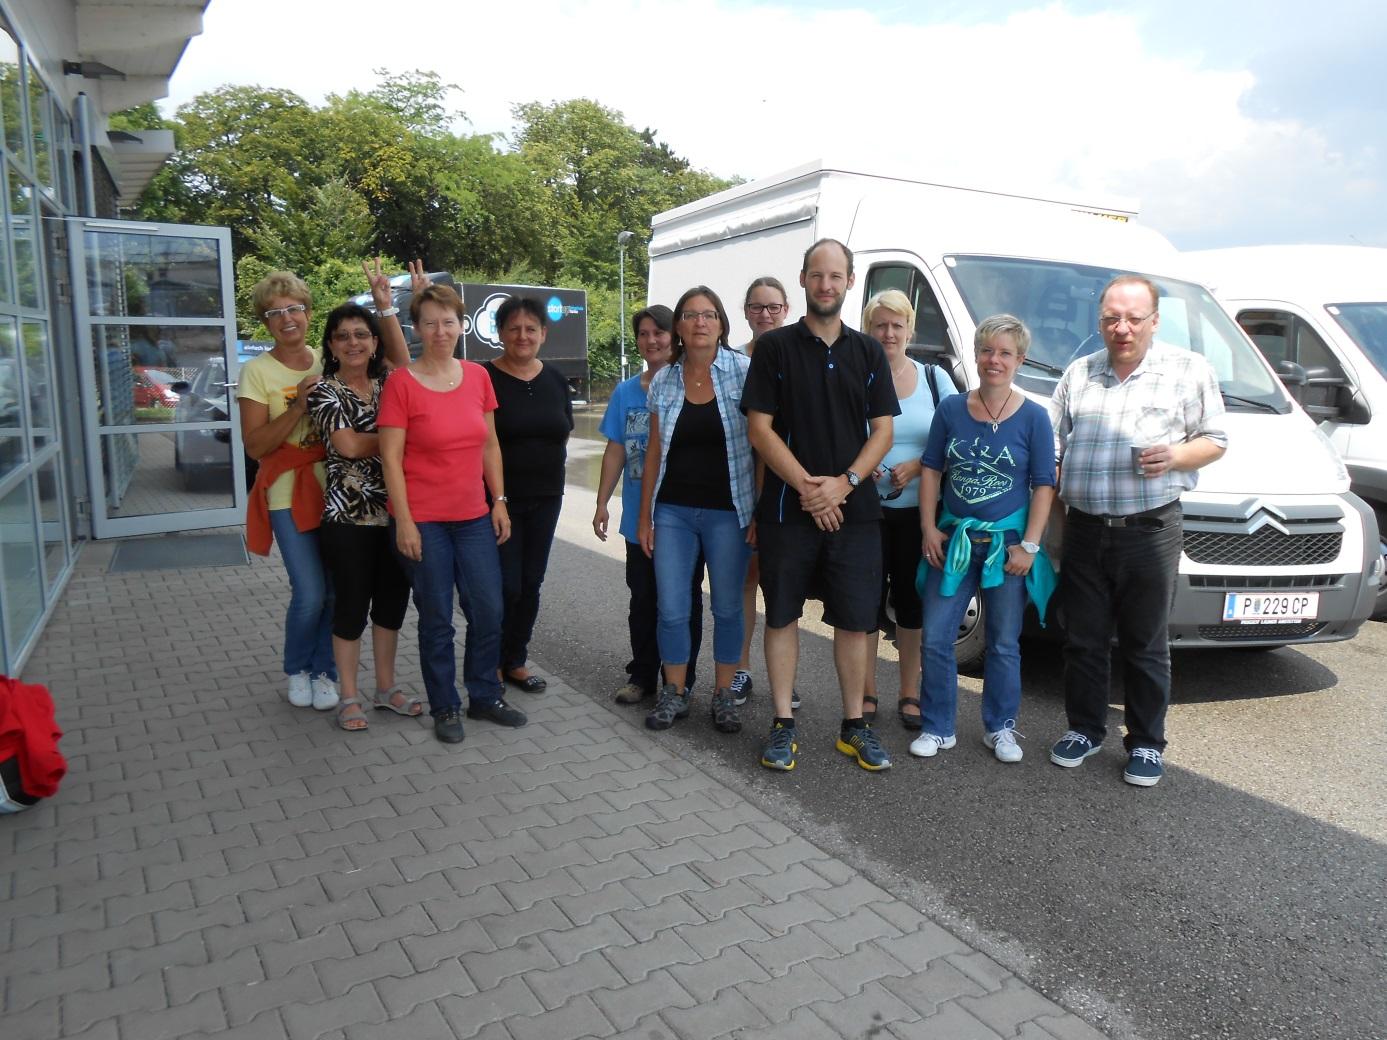 von links nach rechts: Inge Rausch, Silvia Winter, Heidemarie Hackl, Gabriele Huschak, Alexandra Hinterleitner, Gabriele Kranl, Renate Aigner, Tamara Ladner, Christa Ahrer, Christian Naderer,